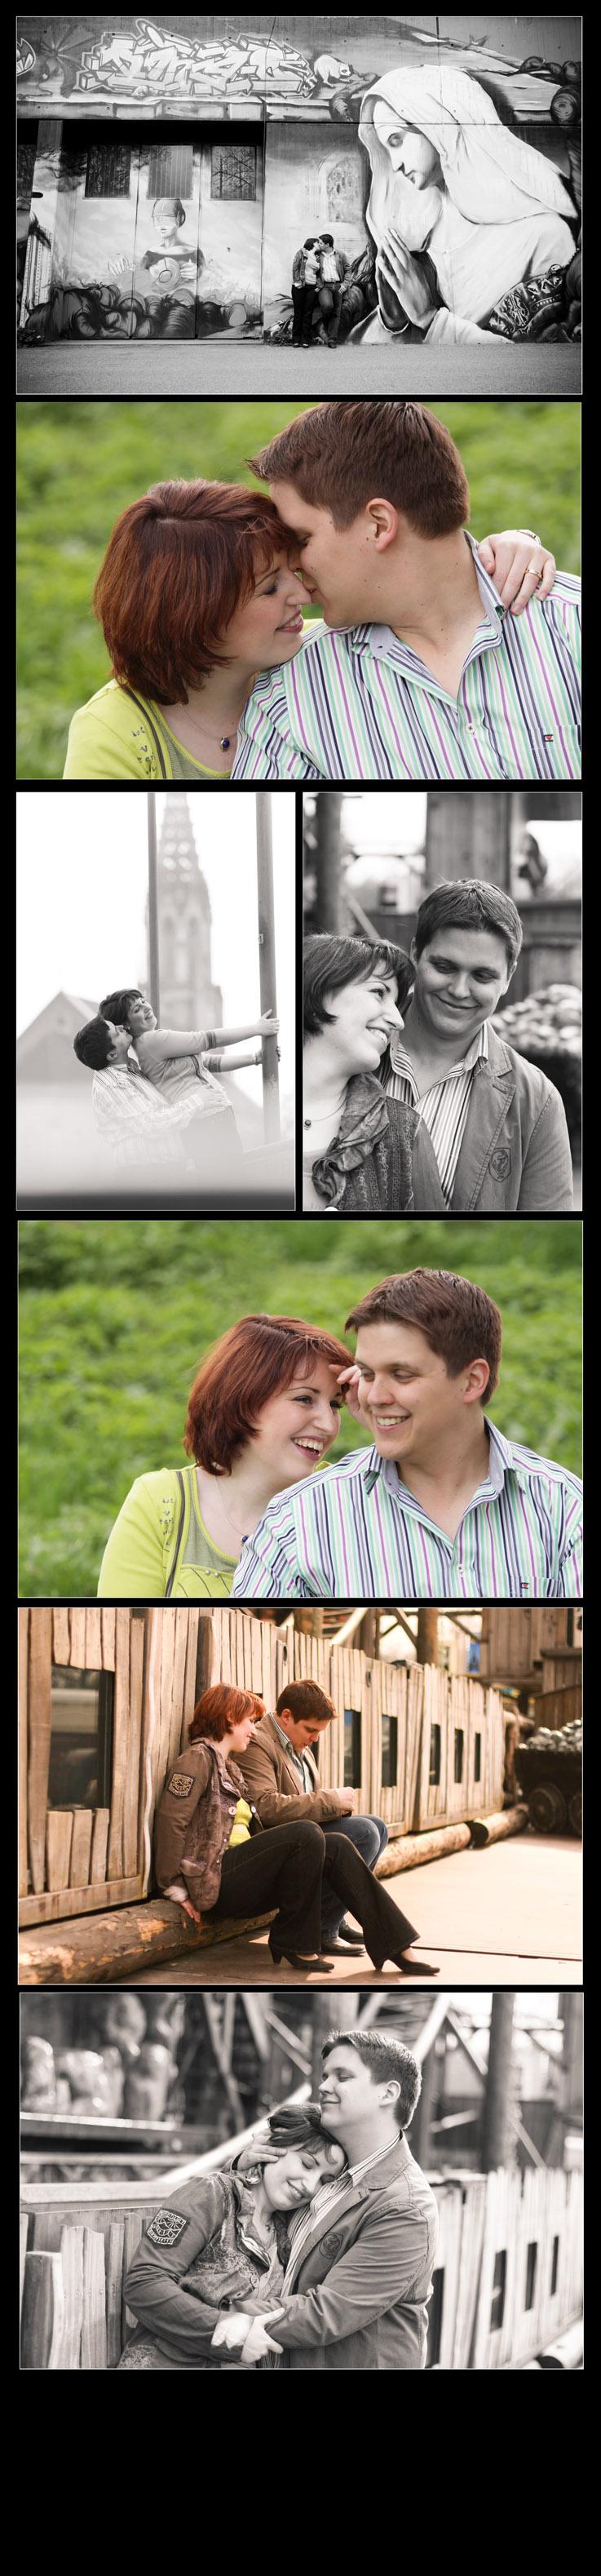 Verlobung Paar Fotograf Stuttgart